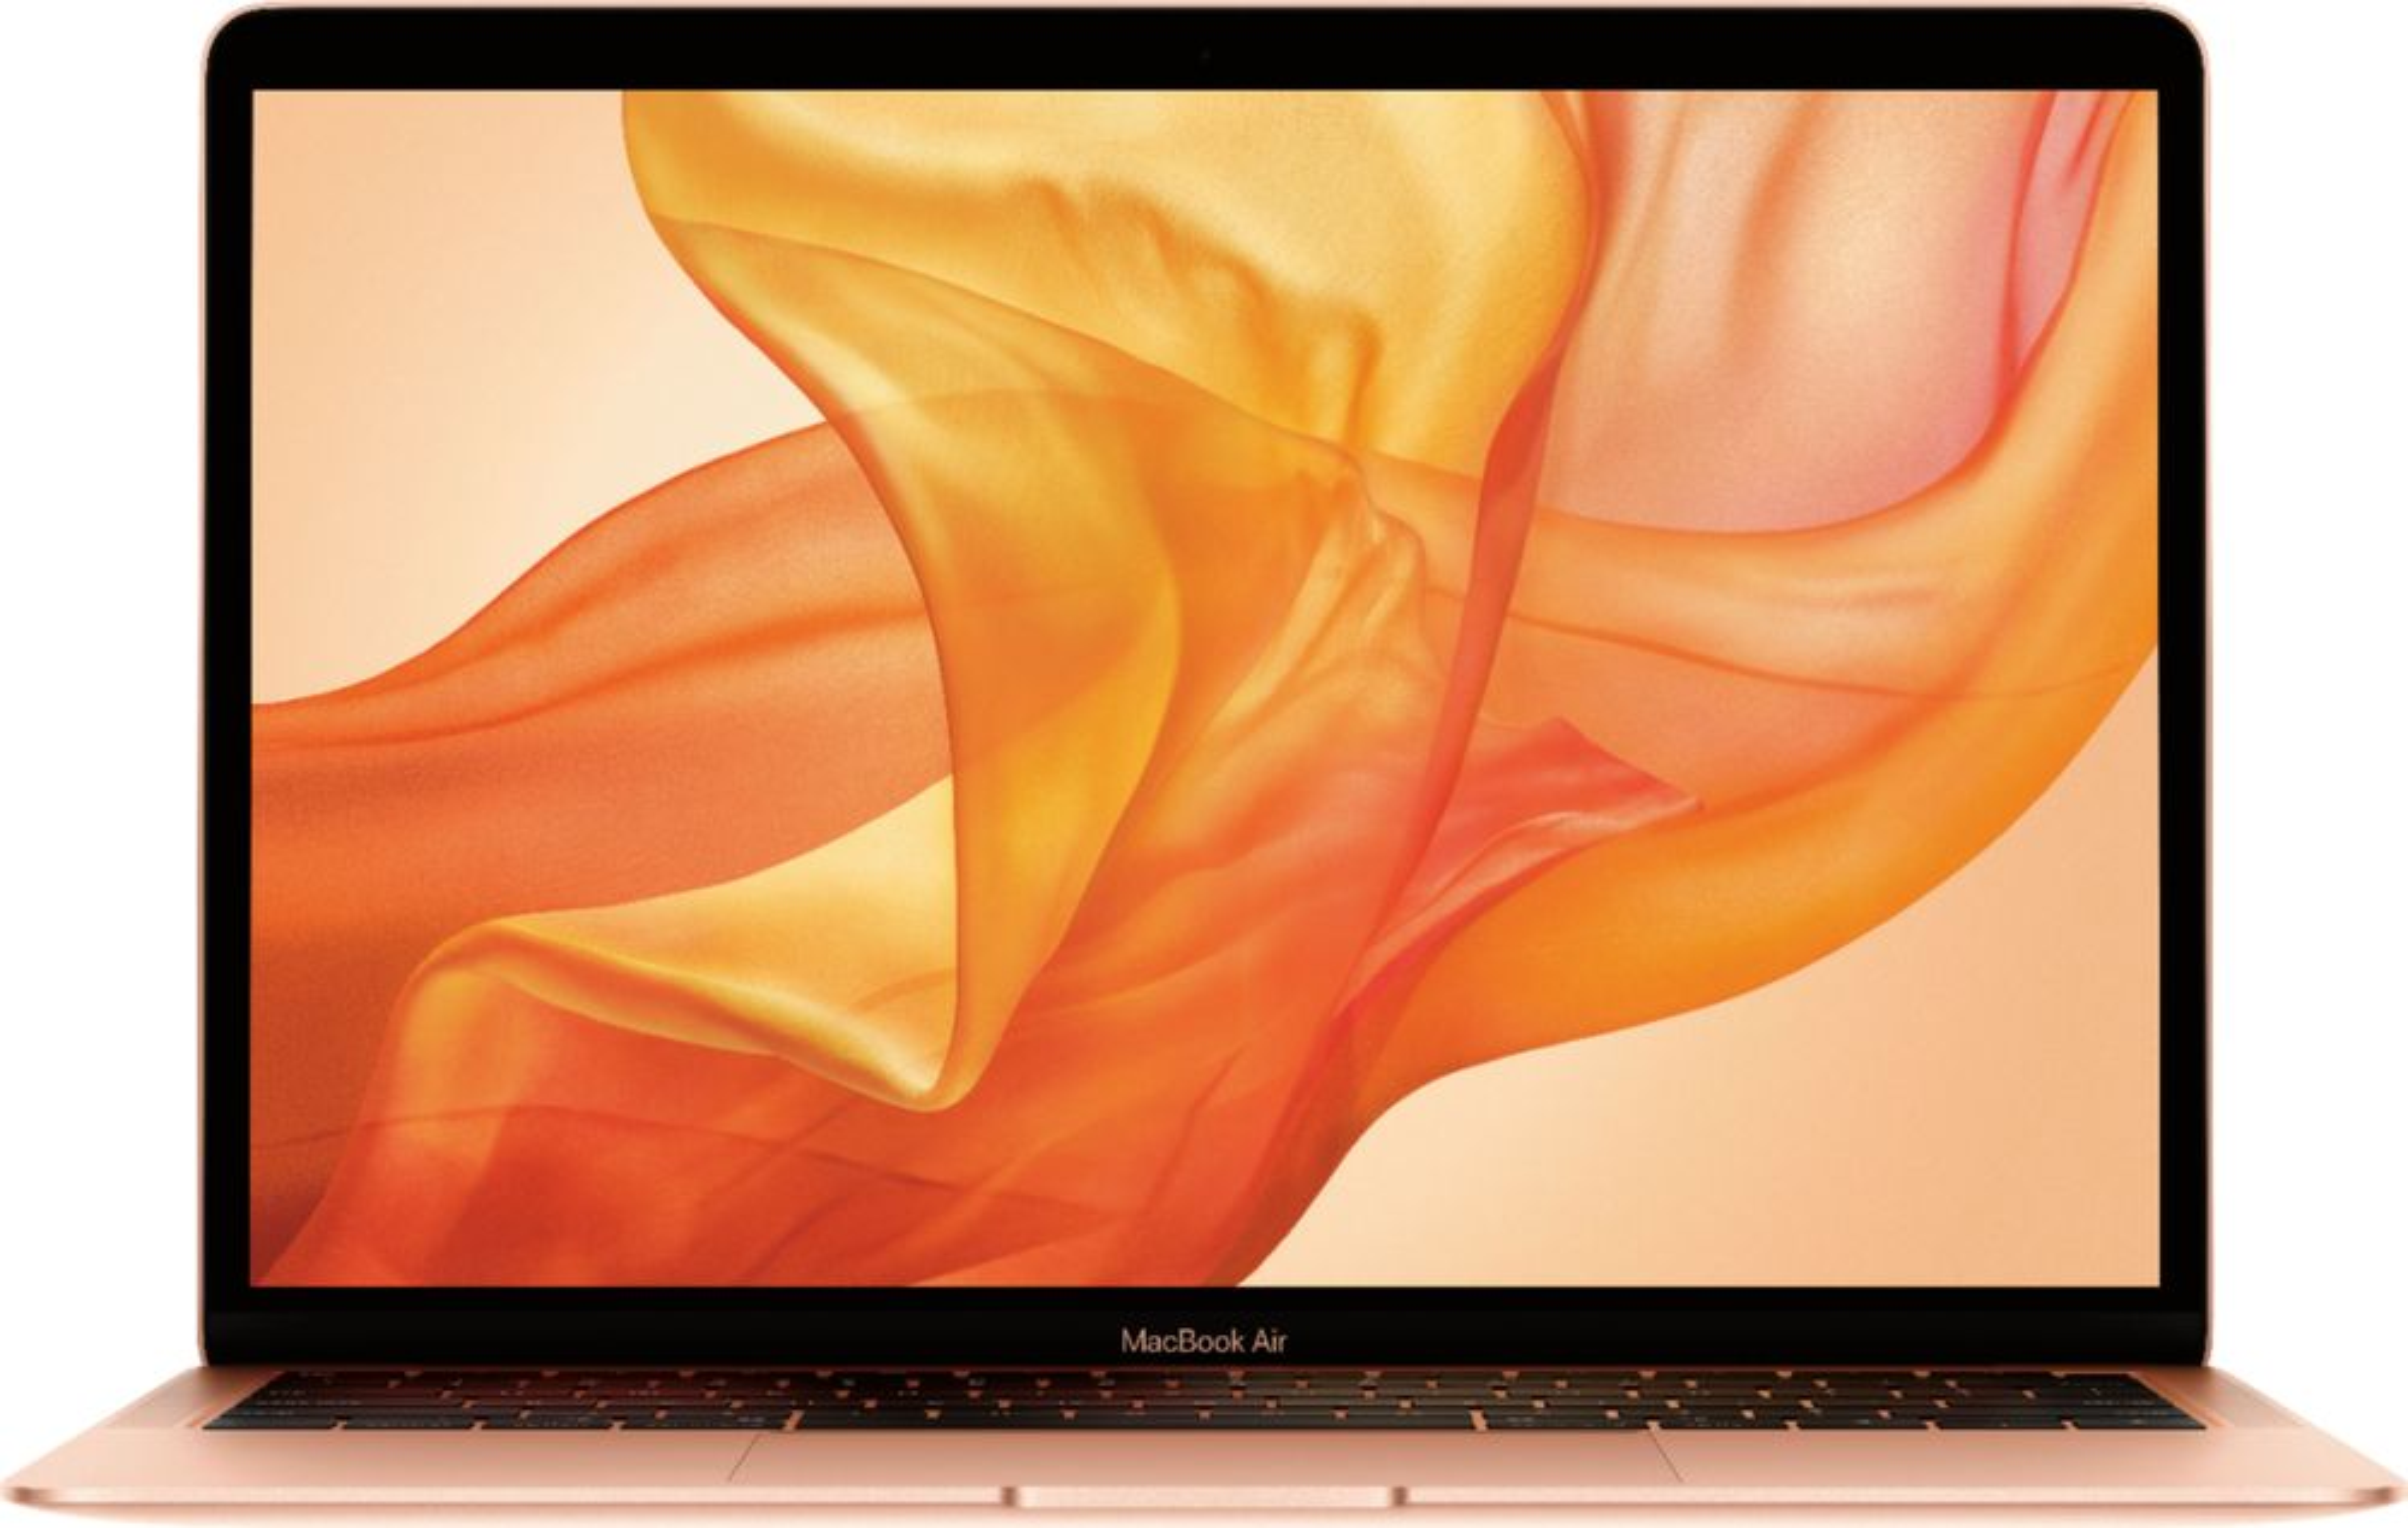 "Apple MacBook Air 13.3"" Retina Display Intel Core i5 8GB Memory 128GB Flash Storage (Latest Model) Gold MREE2LL/A"